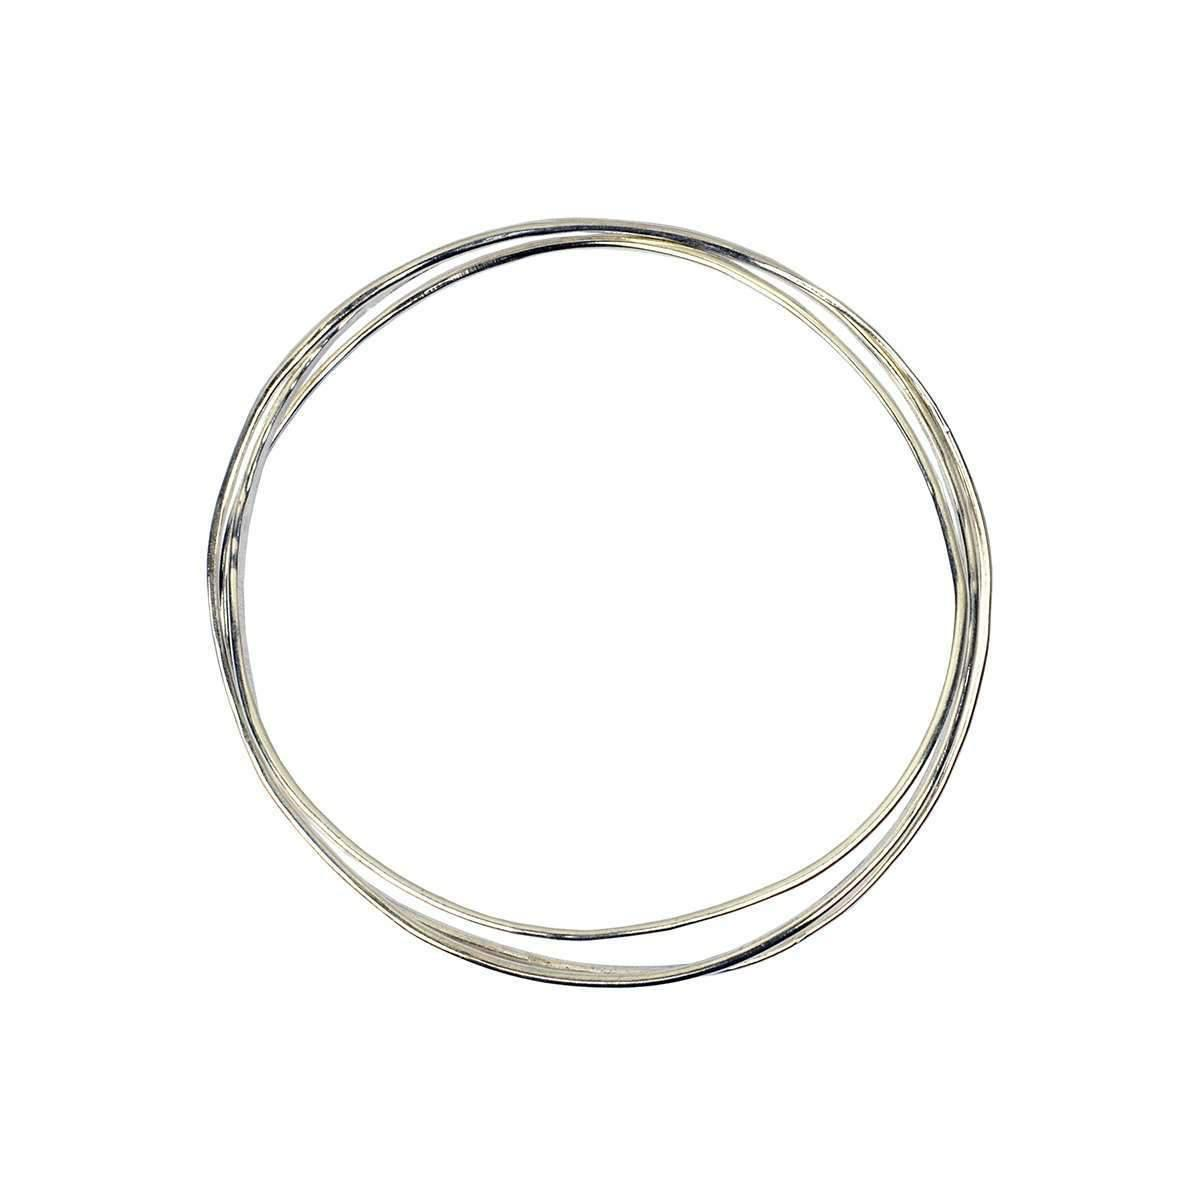 Fran Regan Jewellery Wave Silver 3 Tier Bangle M08wUmJ8n1